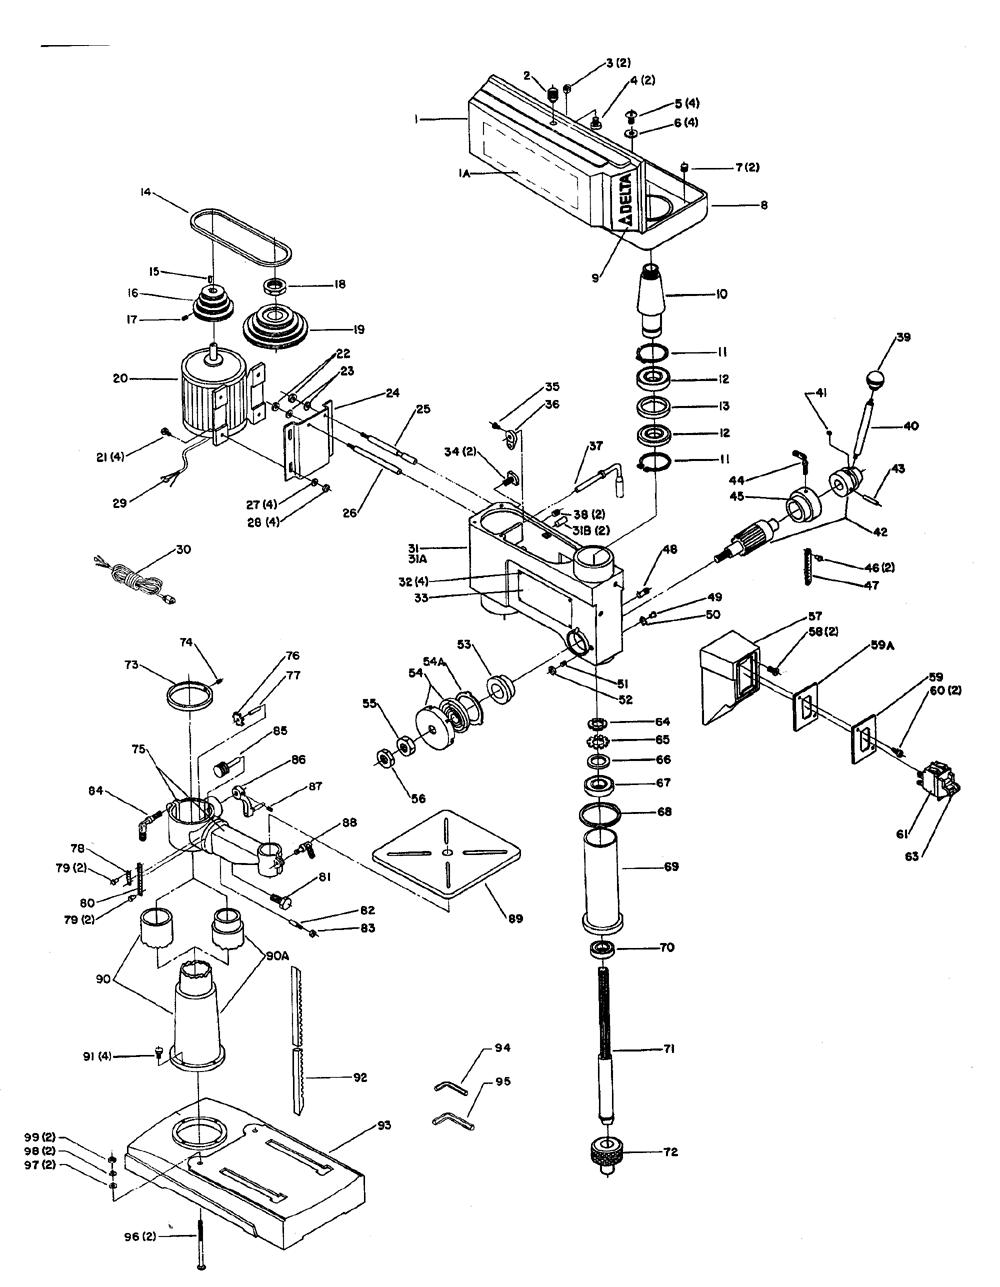 medium resolution of  drill press schematics wiring diagrams cks on drill press cabinet drill press lubrication system